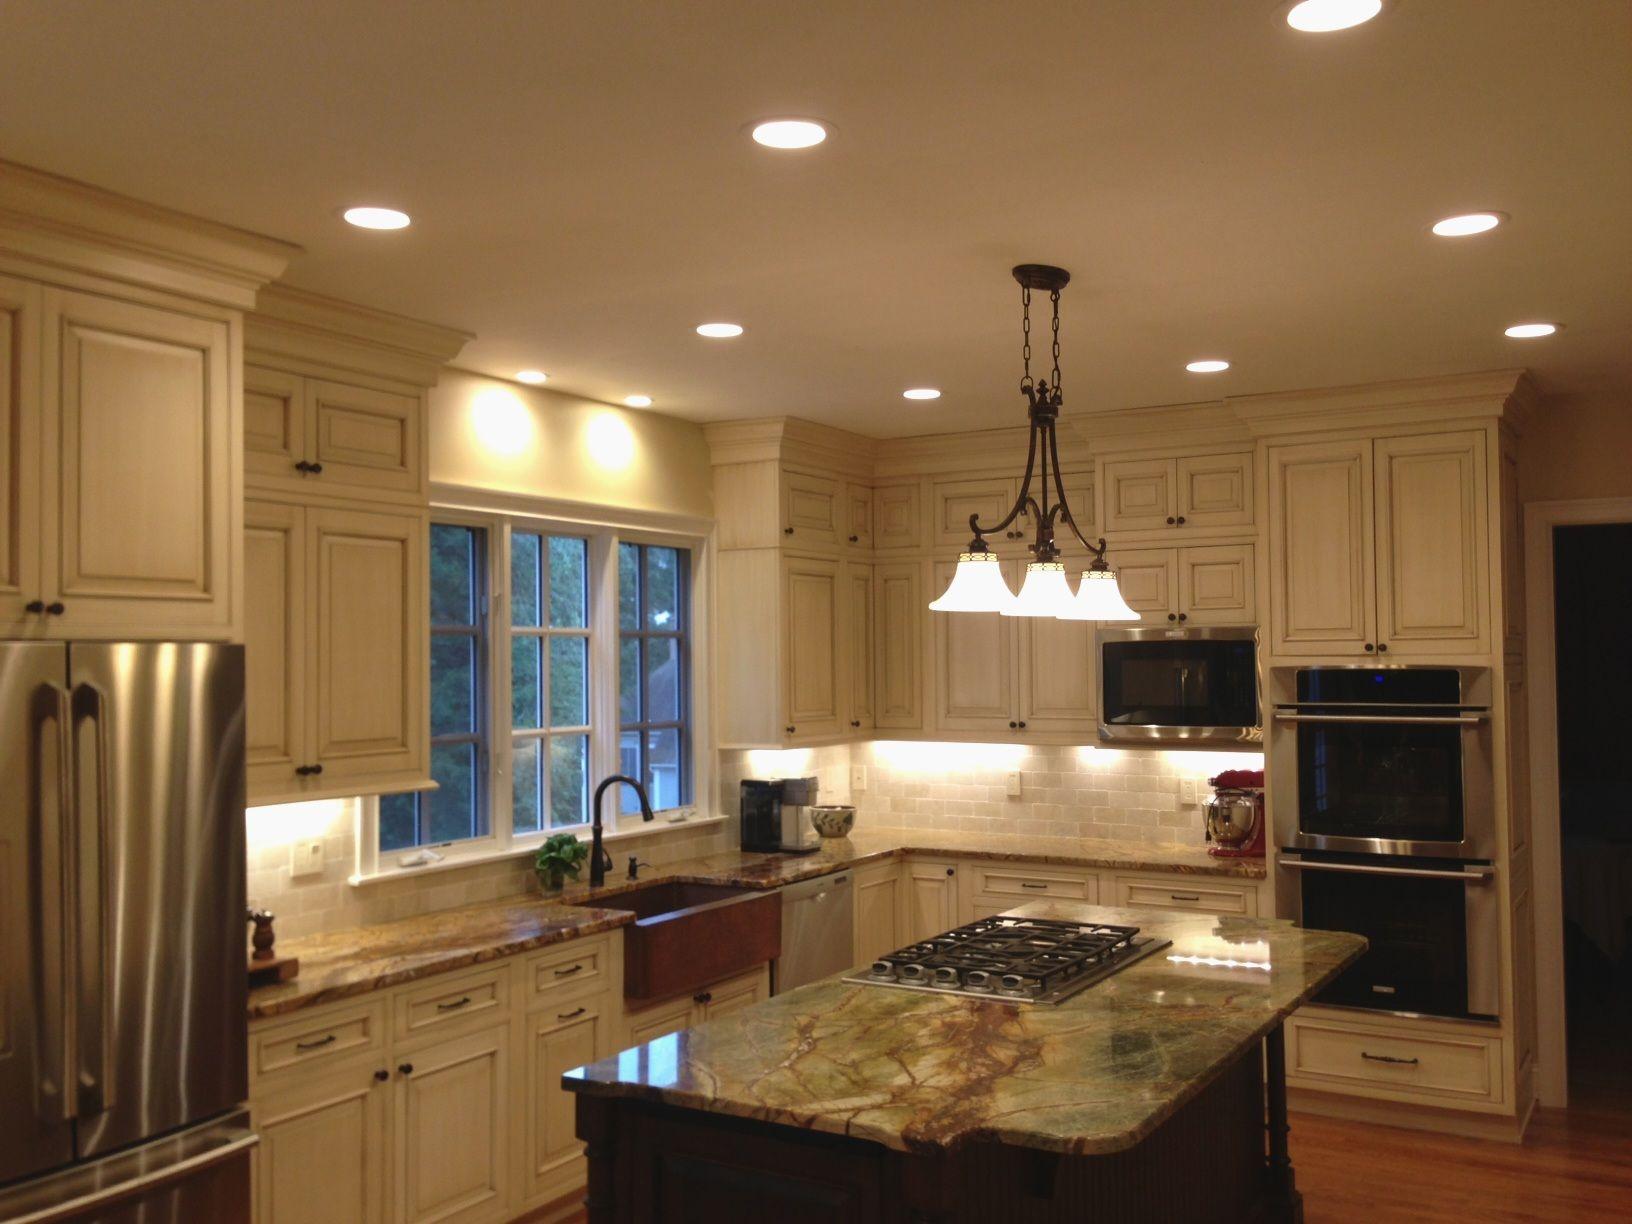 diy kitchen lighting. Kitchen Recessed Lighting Diy Shallow E